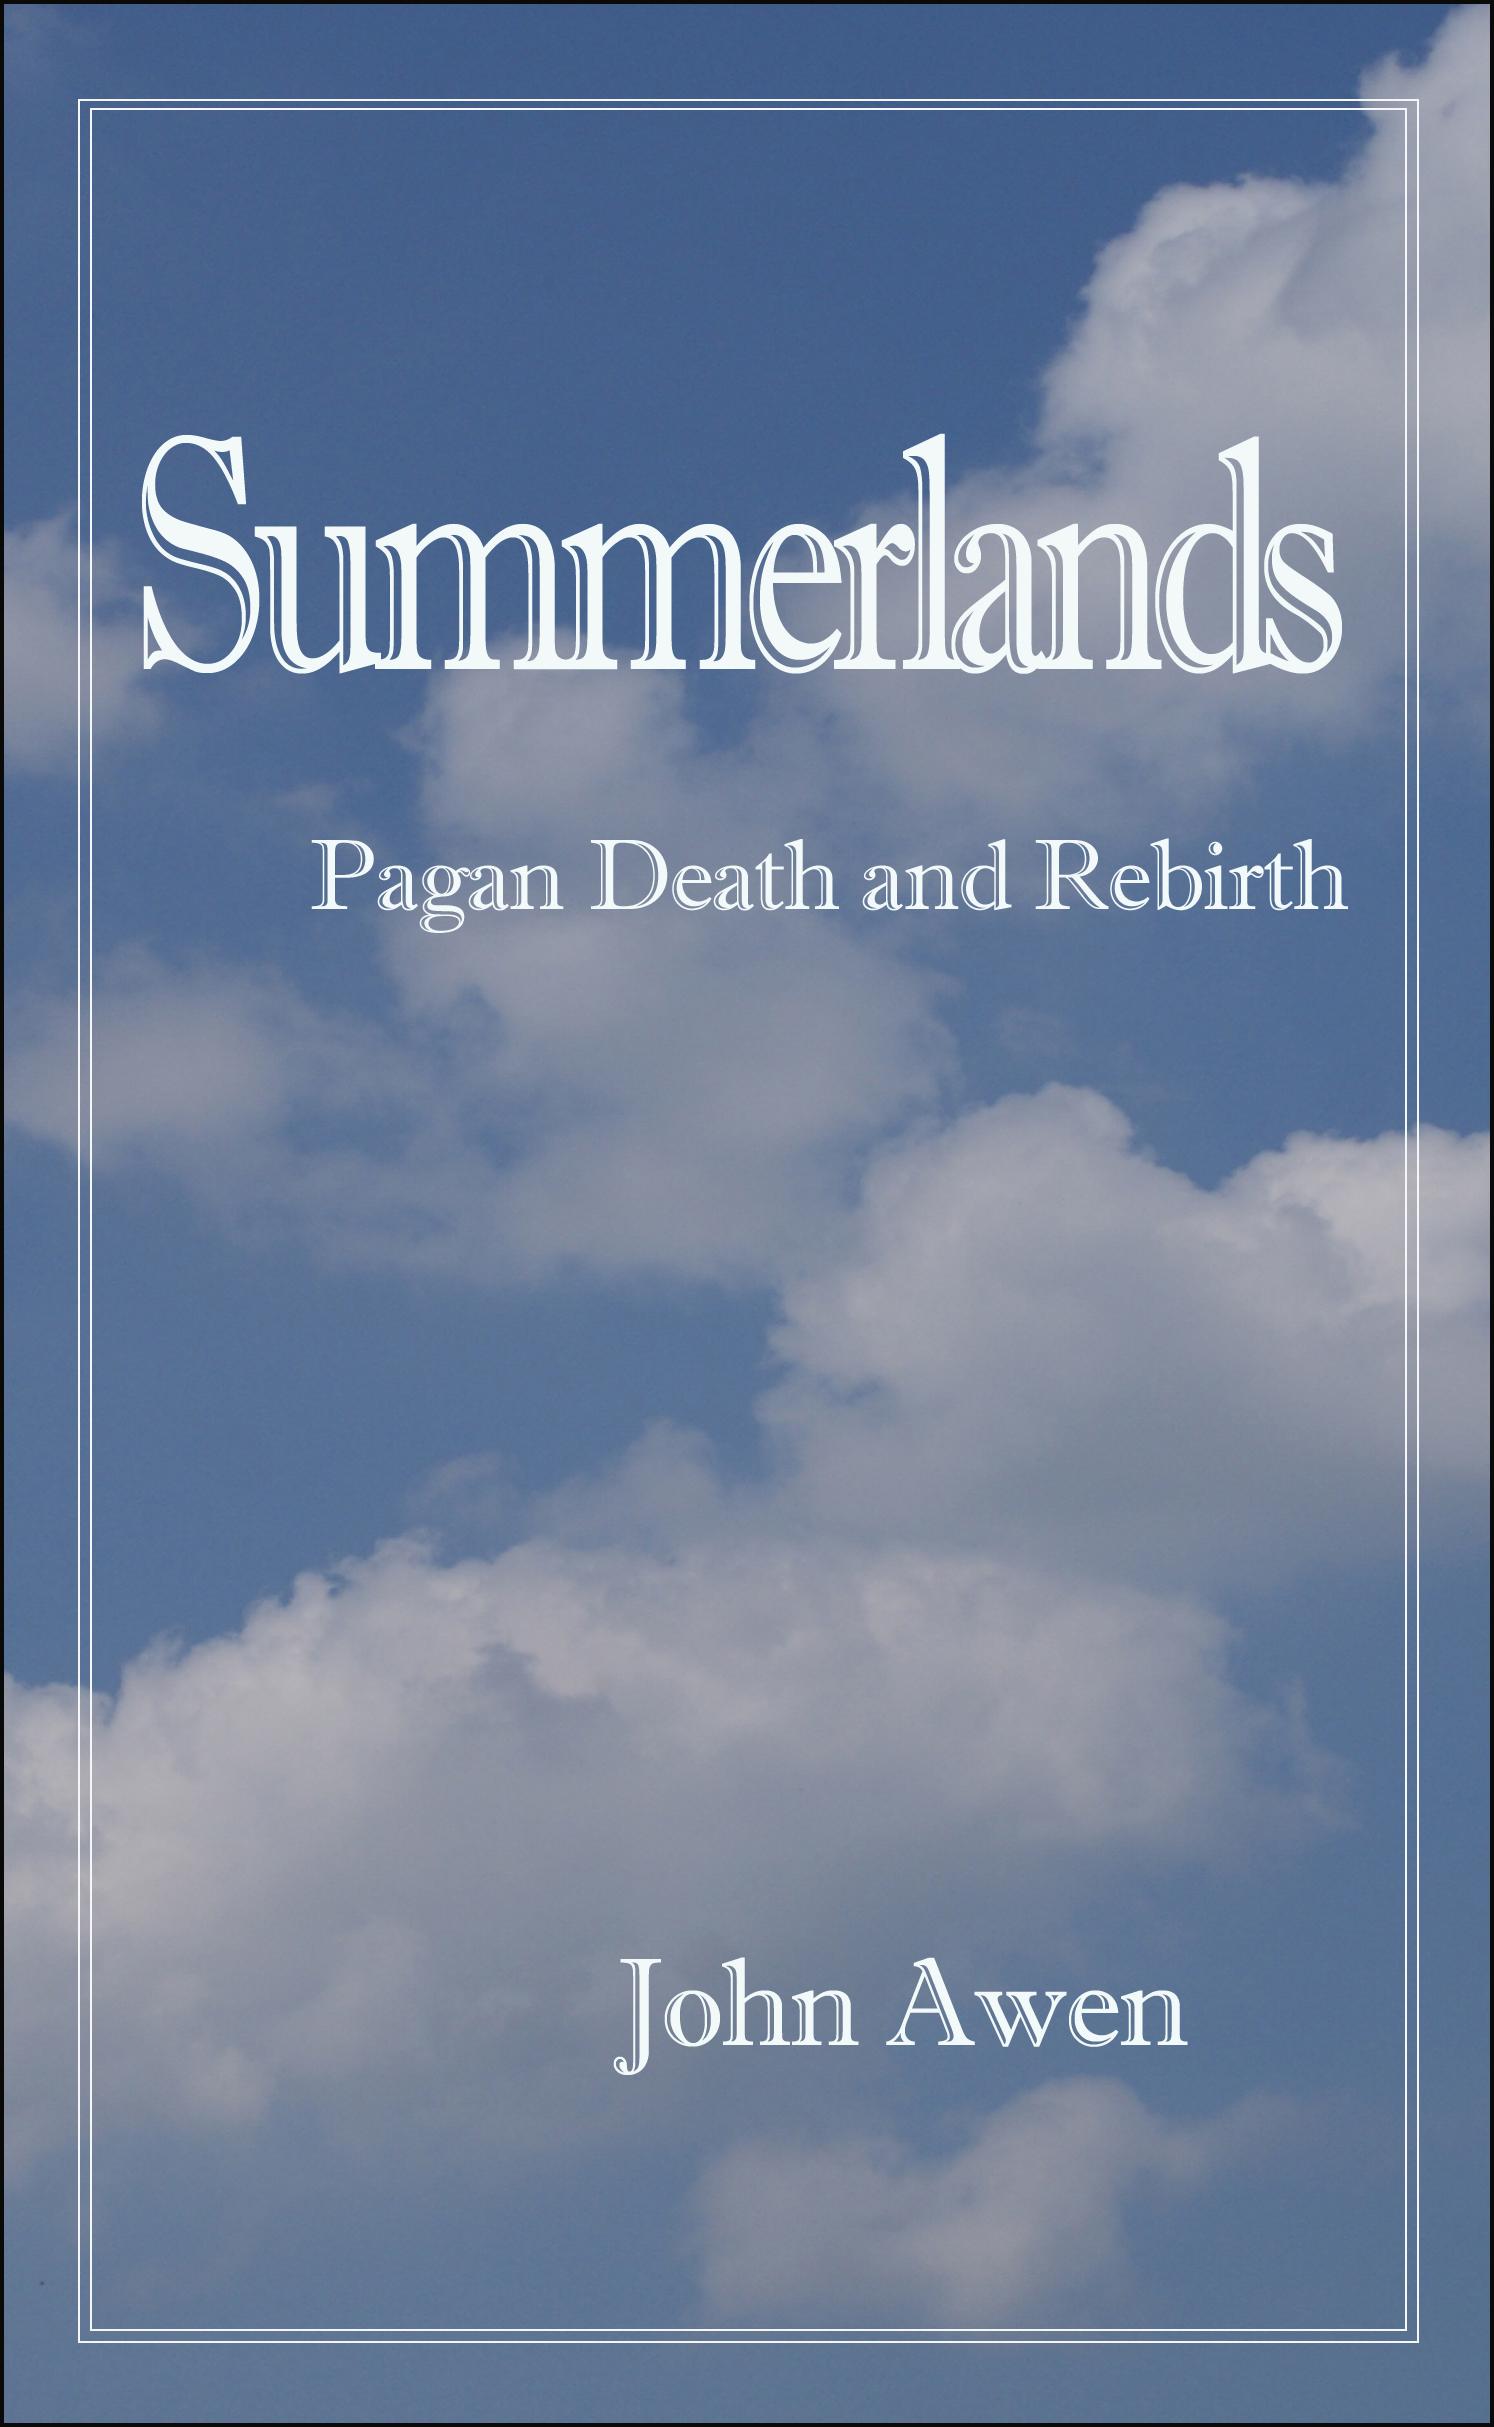 Summerlands